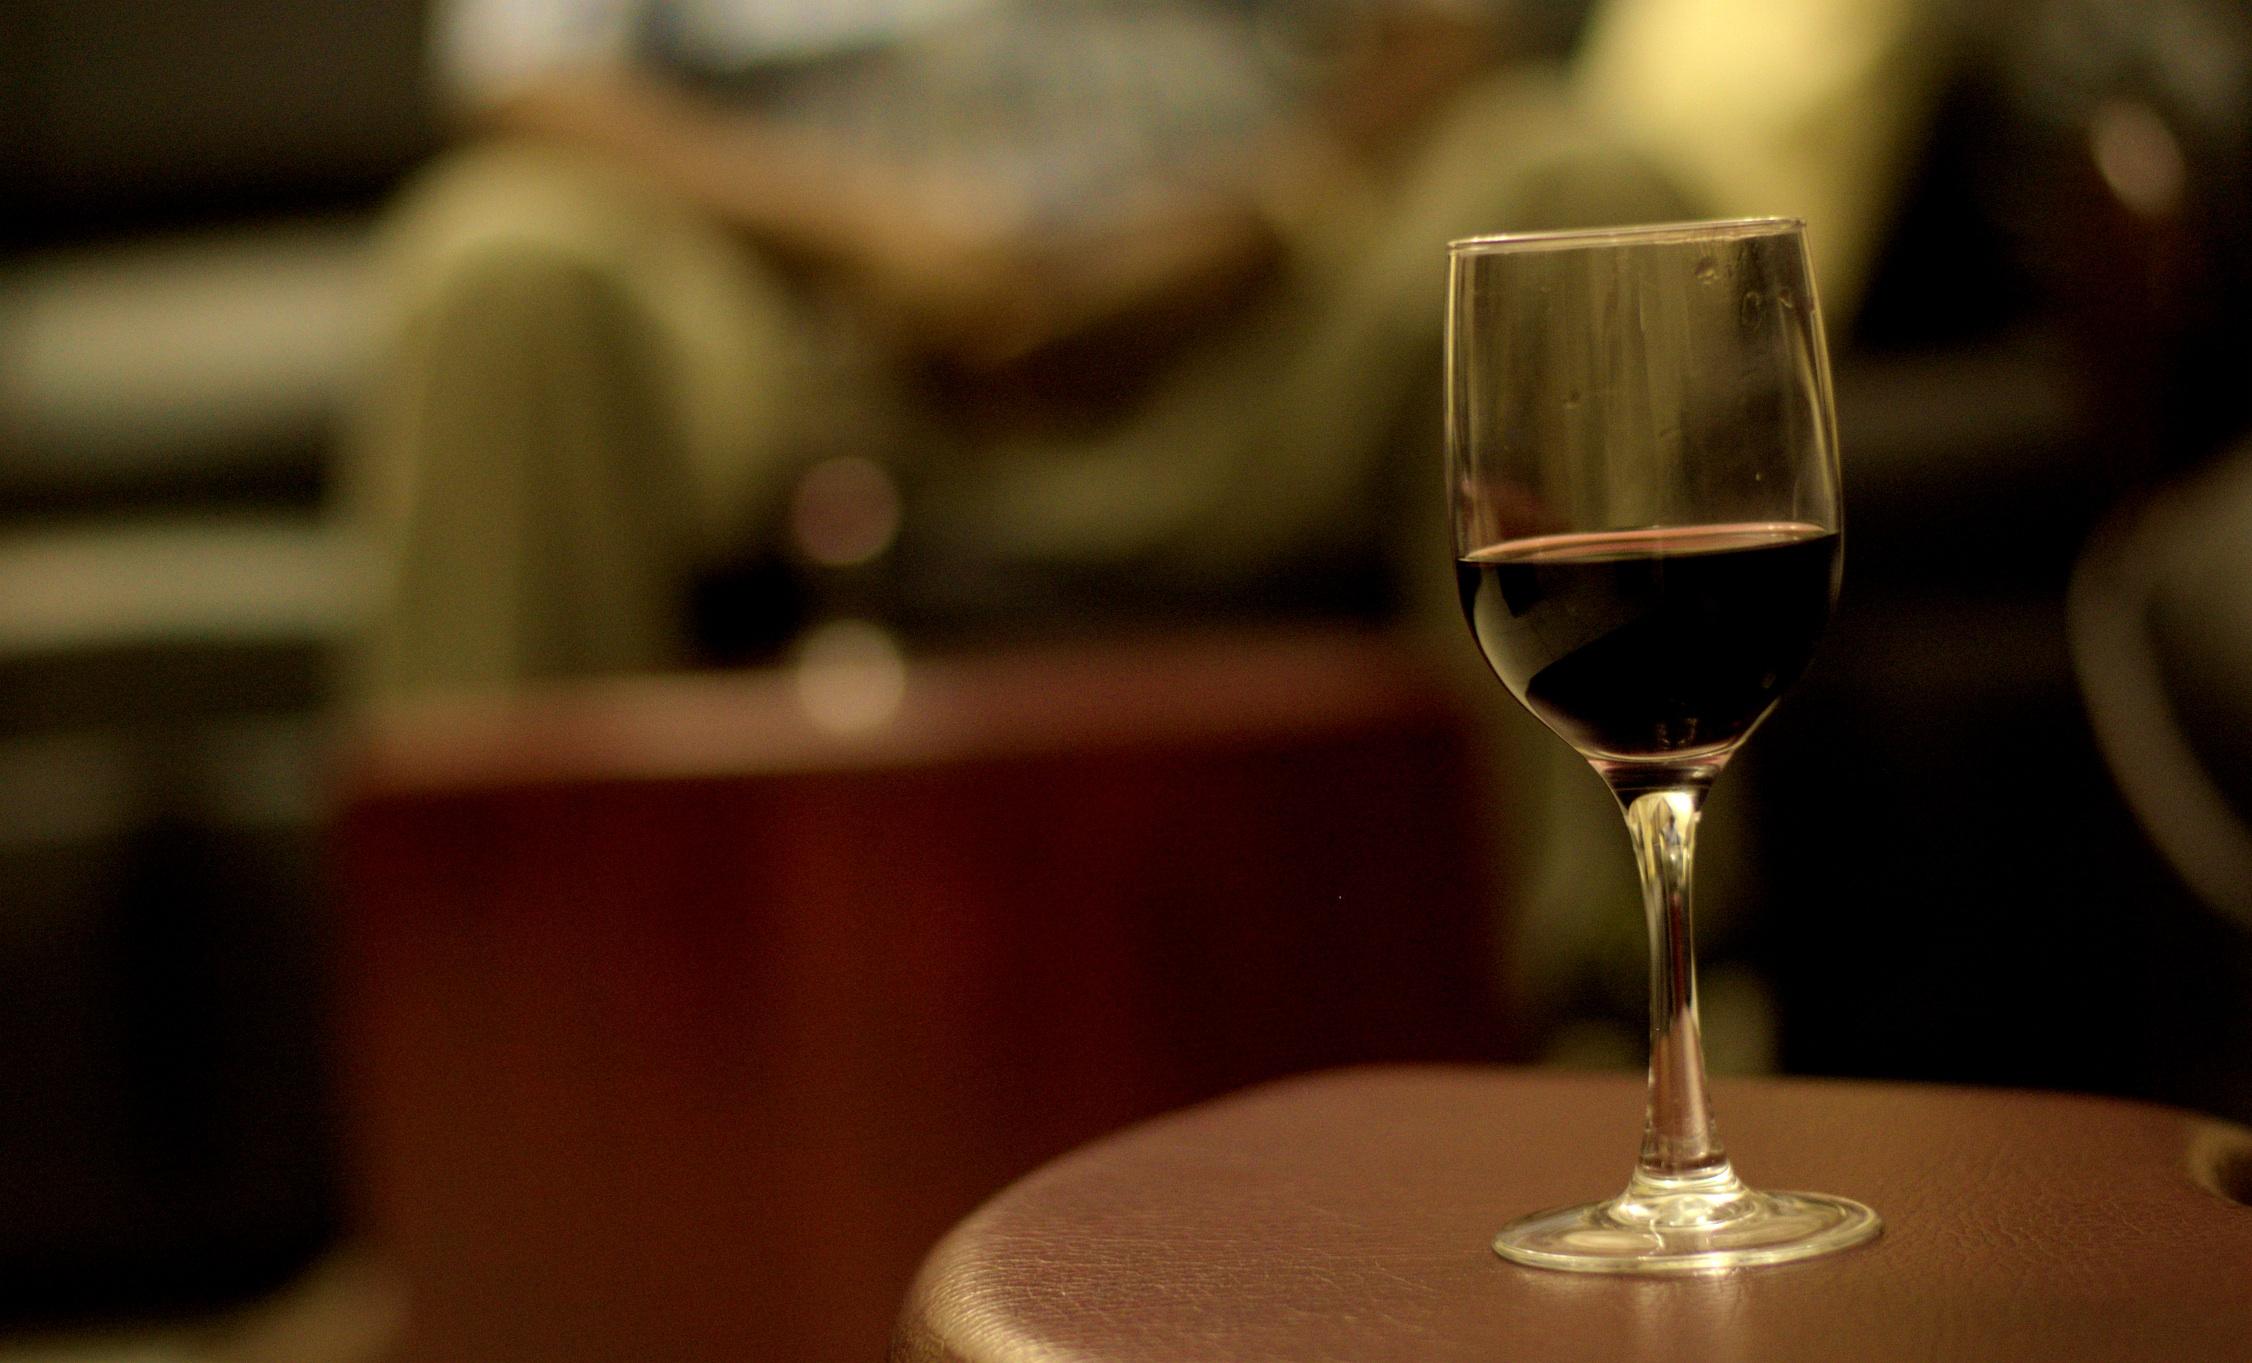 HOME-MADE WINE STOLEN BY ALCOHOLIC BURGLAR